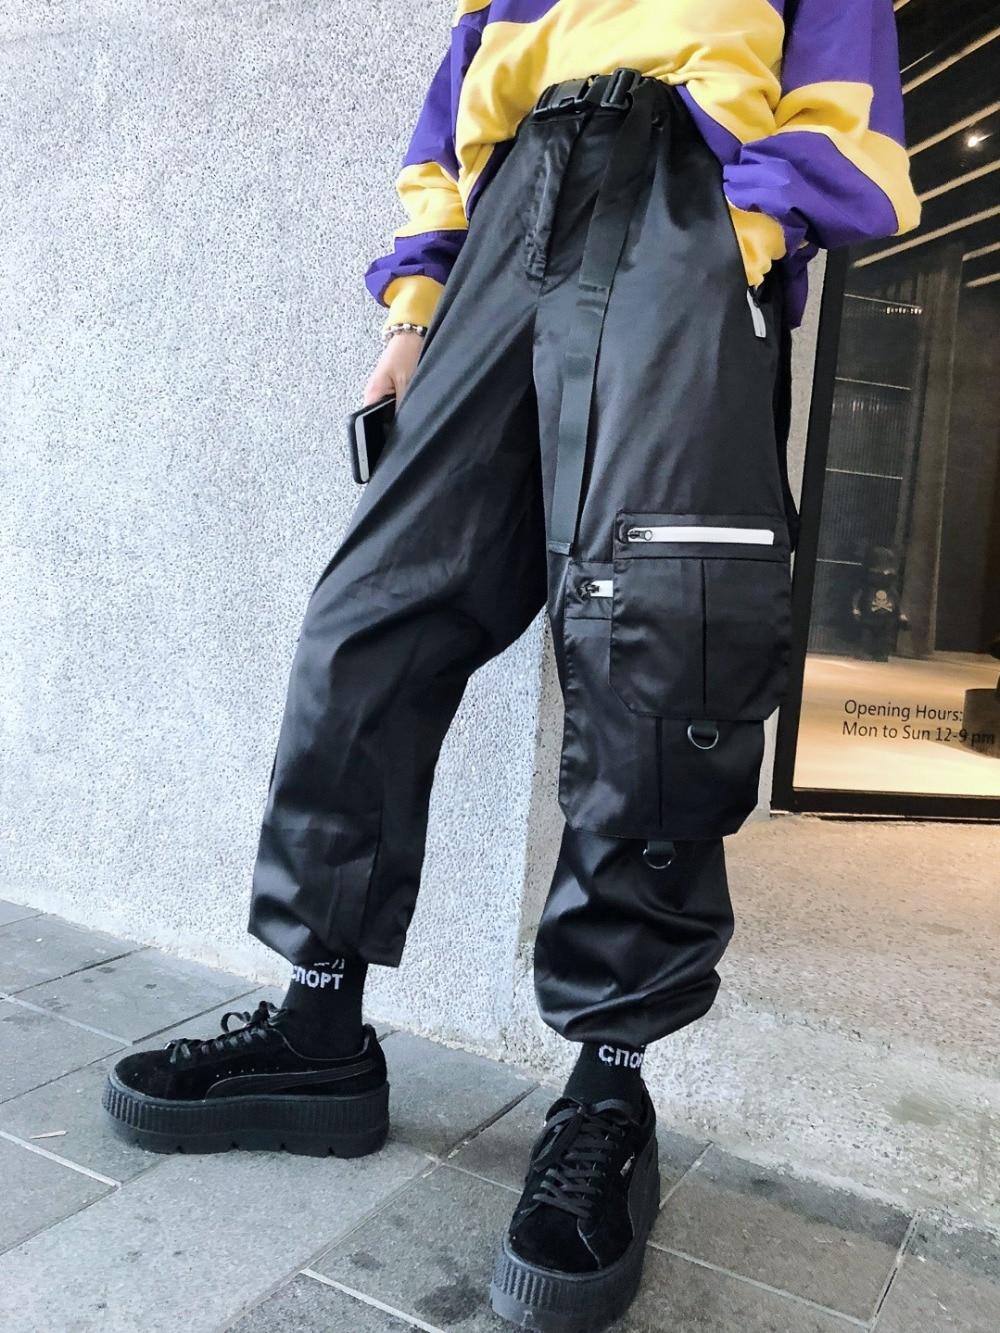 Bolsillos Guo Múltiples Apriete Negro Casuales De Pantalones Hip Empalme gris Hebilla Cintura Chao hop 8U8qzr